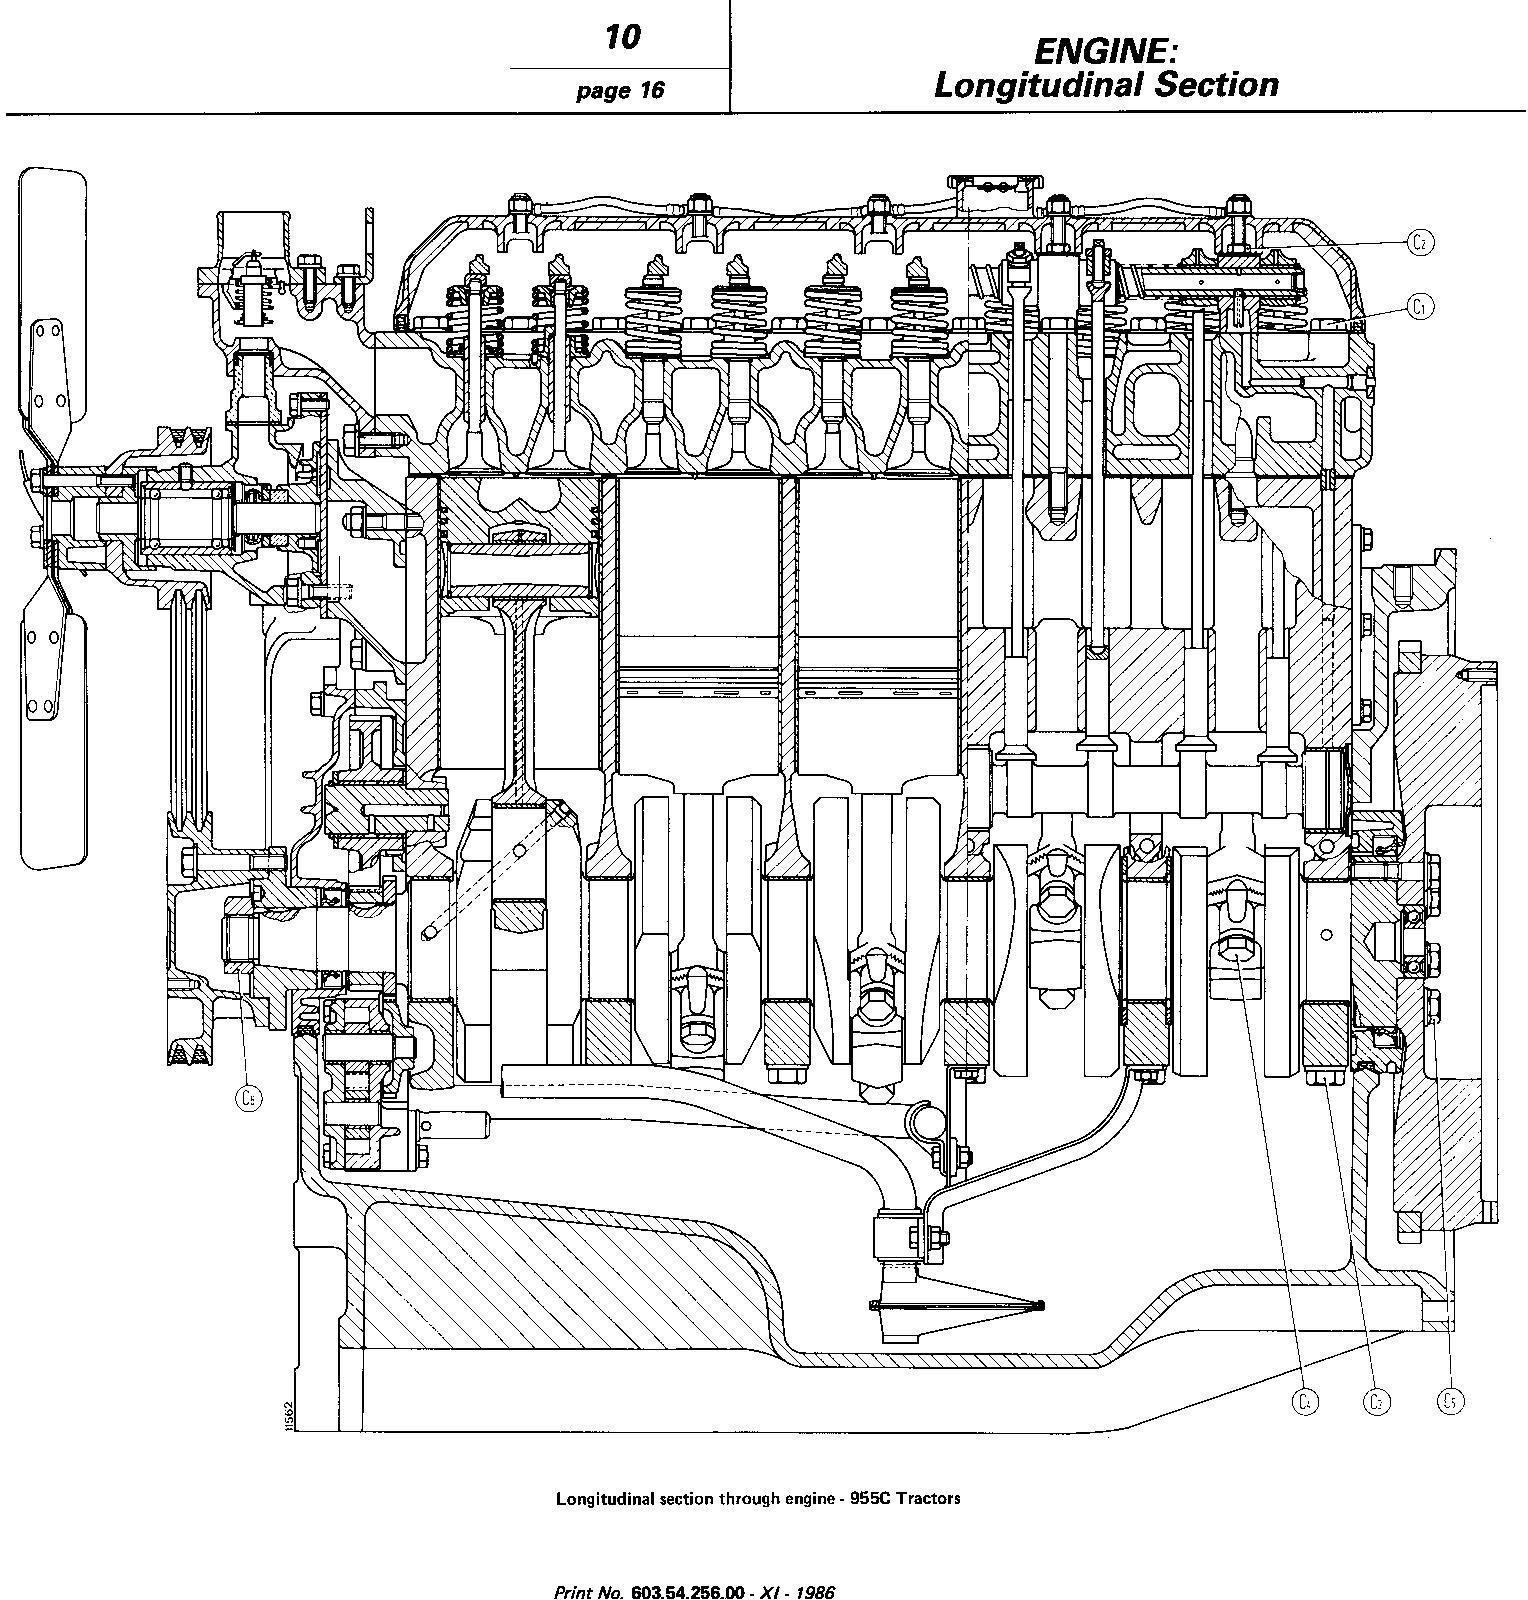 Fiat 855C, 955C, 85-55, 95-55 Crawler Tractor Workshop Service Manual (6035425600) - 2